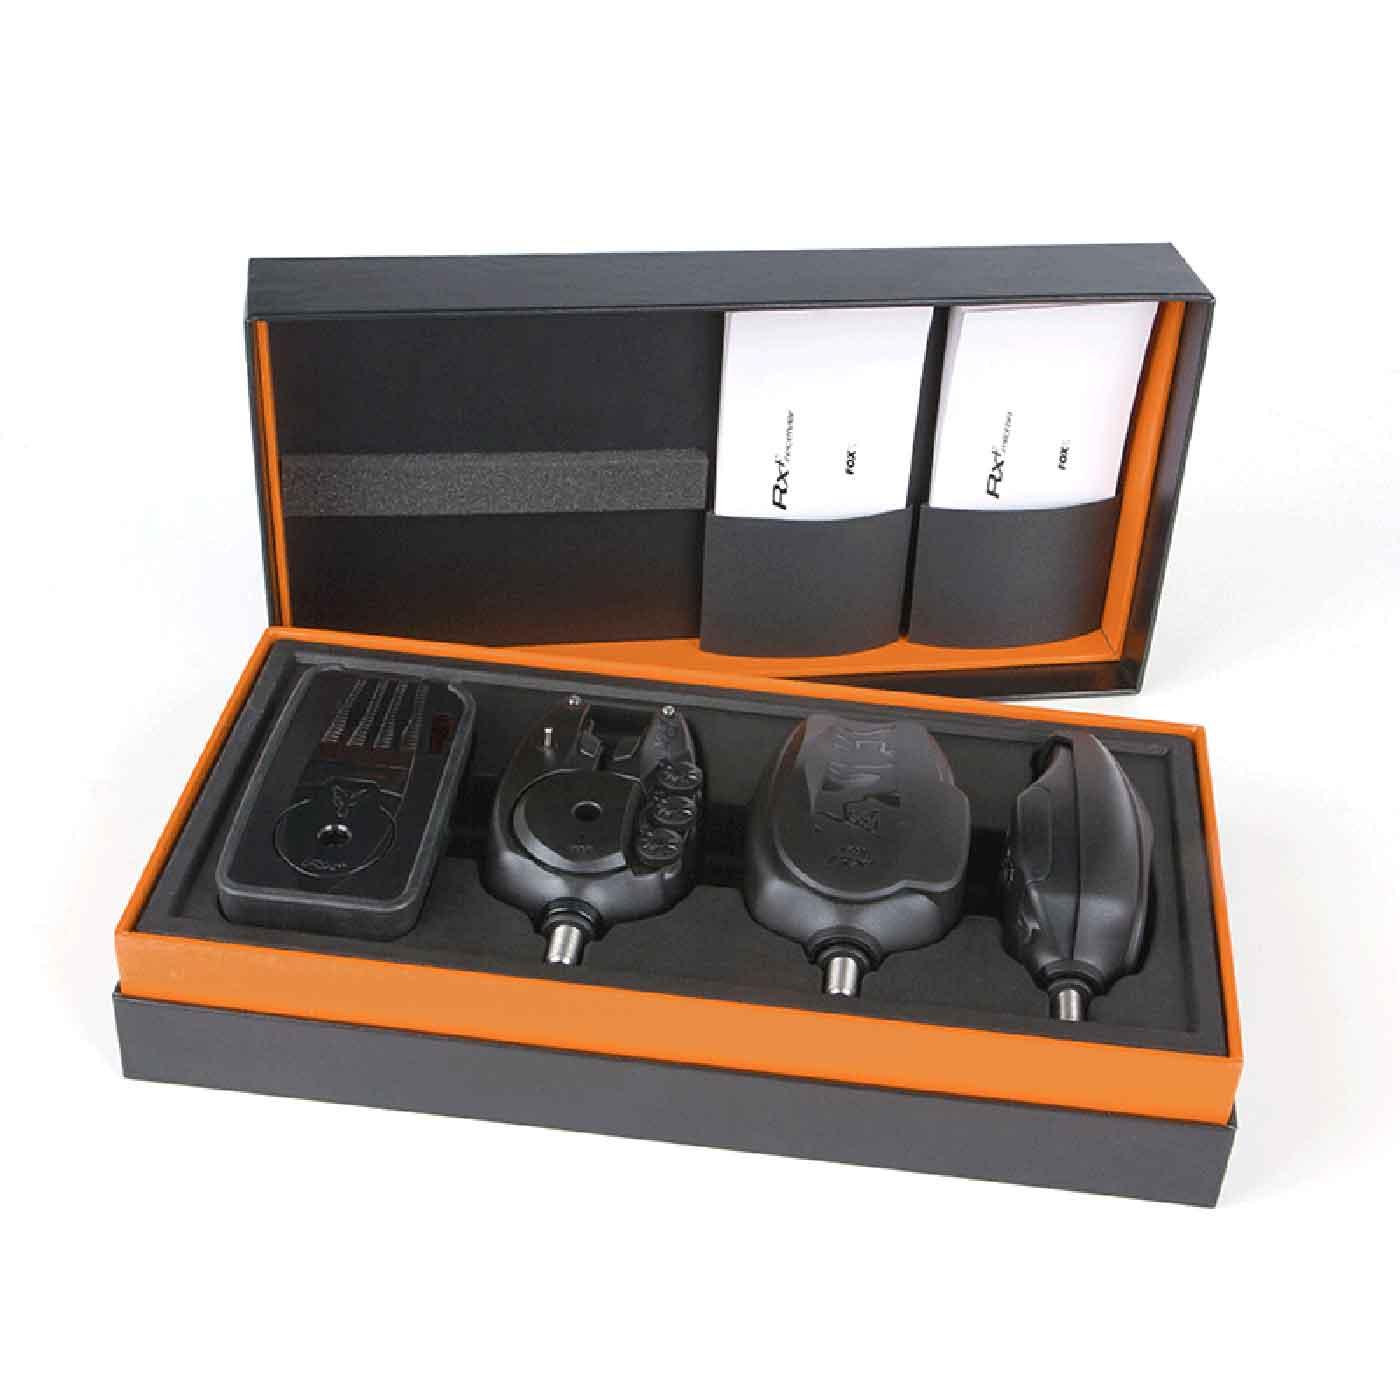 Fox Micron RX+ 3 Rod Alarm Set